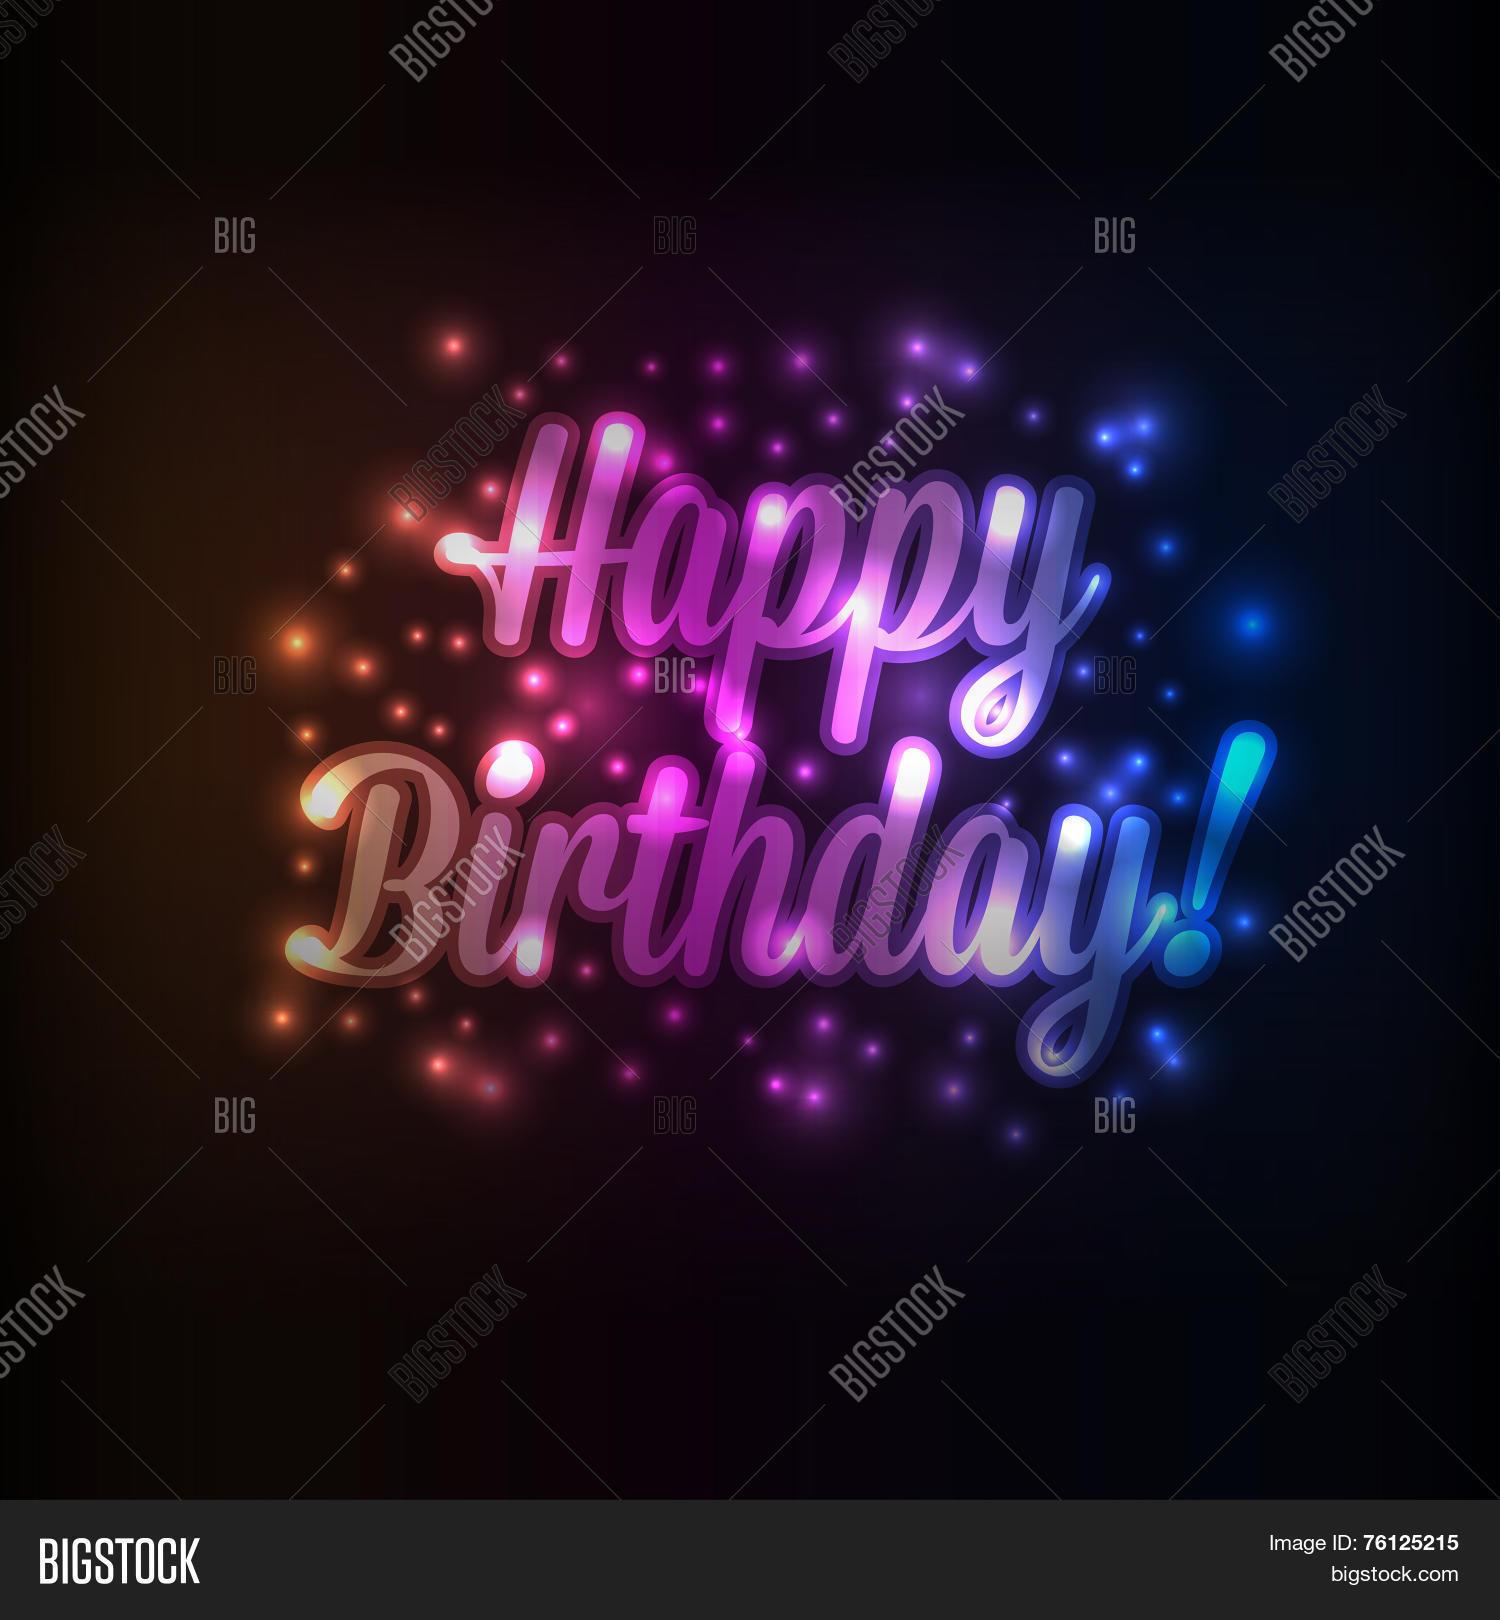 Birthday Photography Lighting: Glowing Lights Happy Birthday Vector & Photo